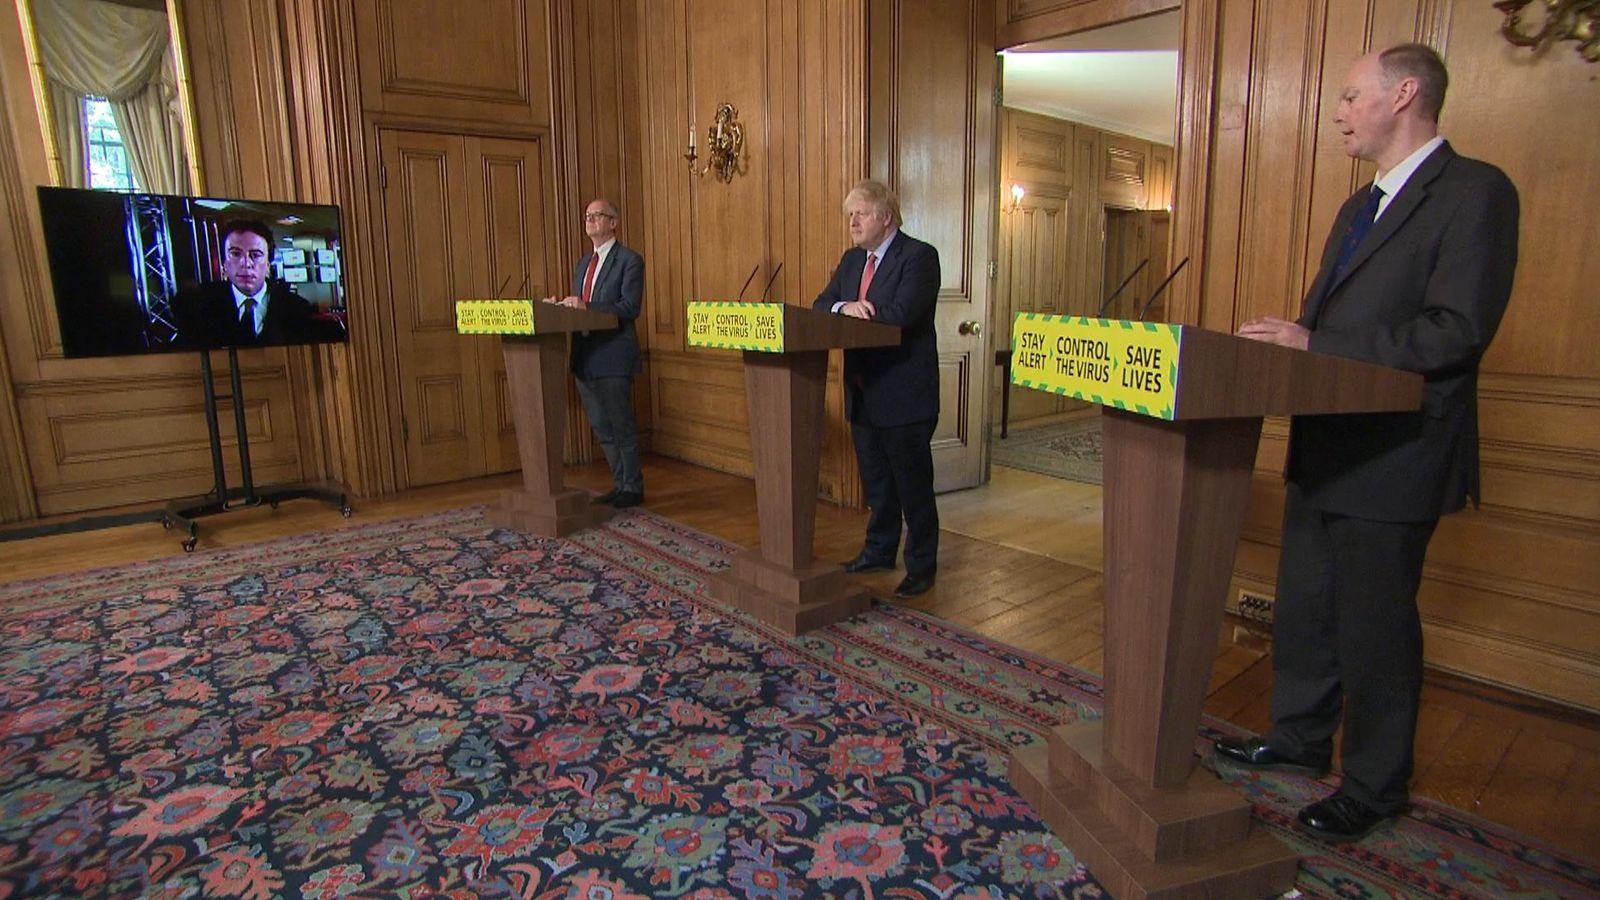 Coronavirus: Boris Johnson stops Chris Whitty and Patrick Vallance answering questions on Dominic Cummings